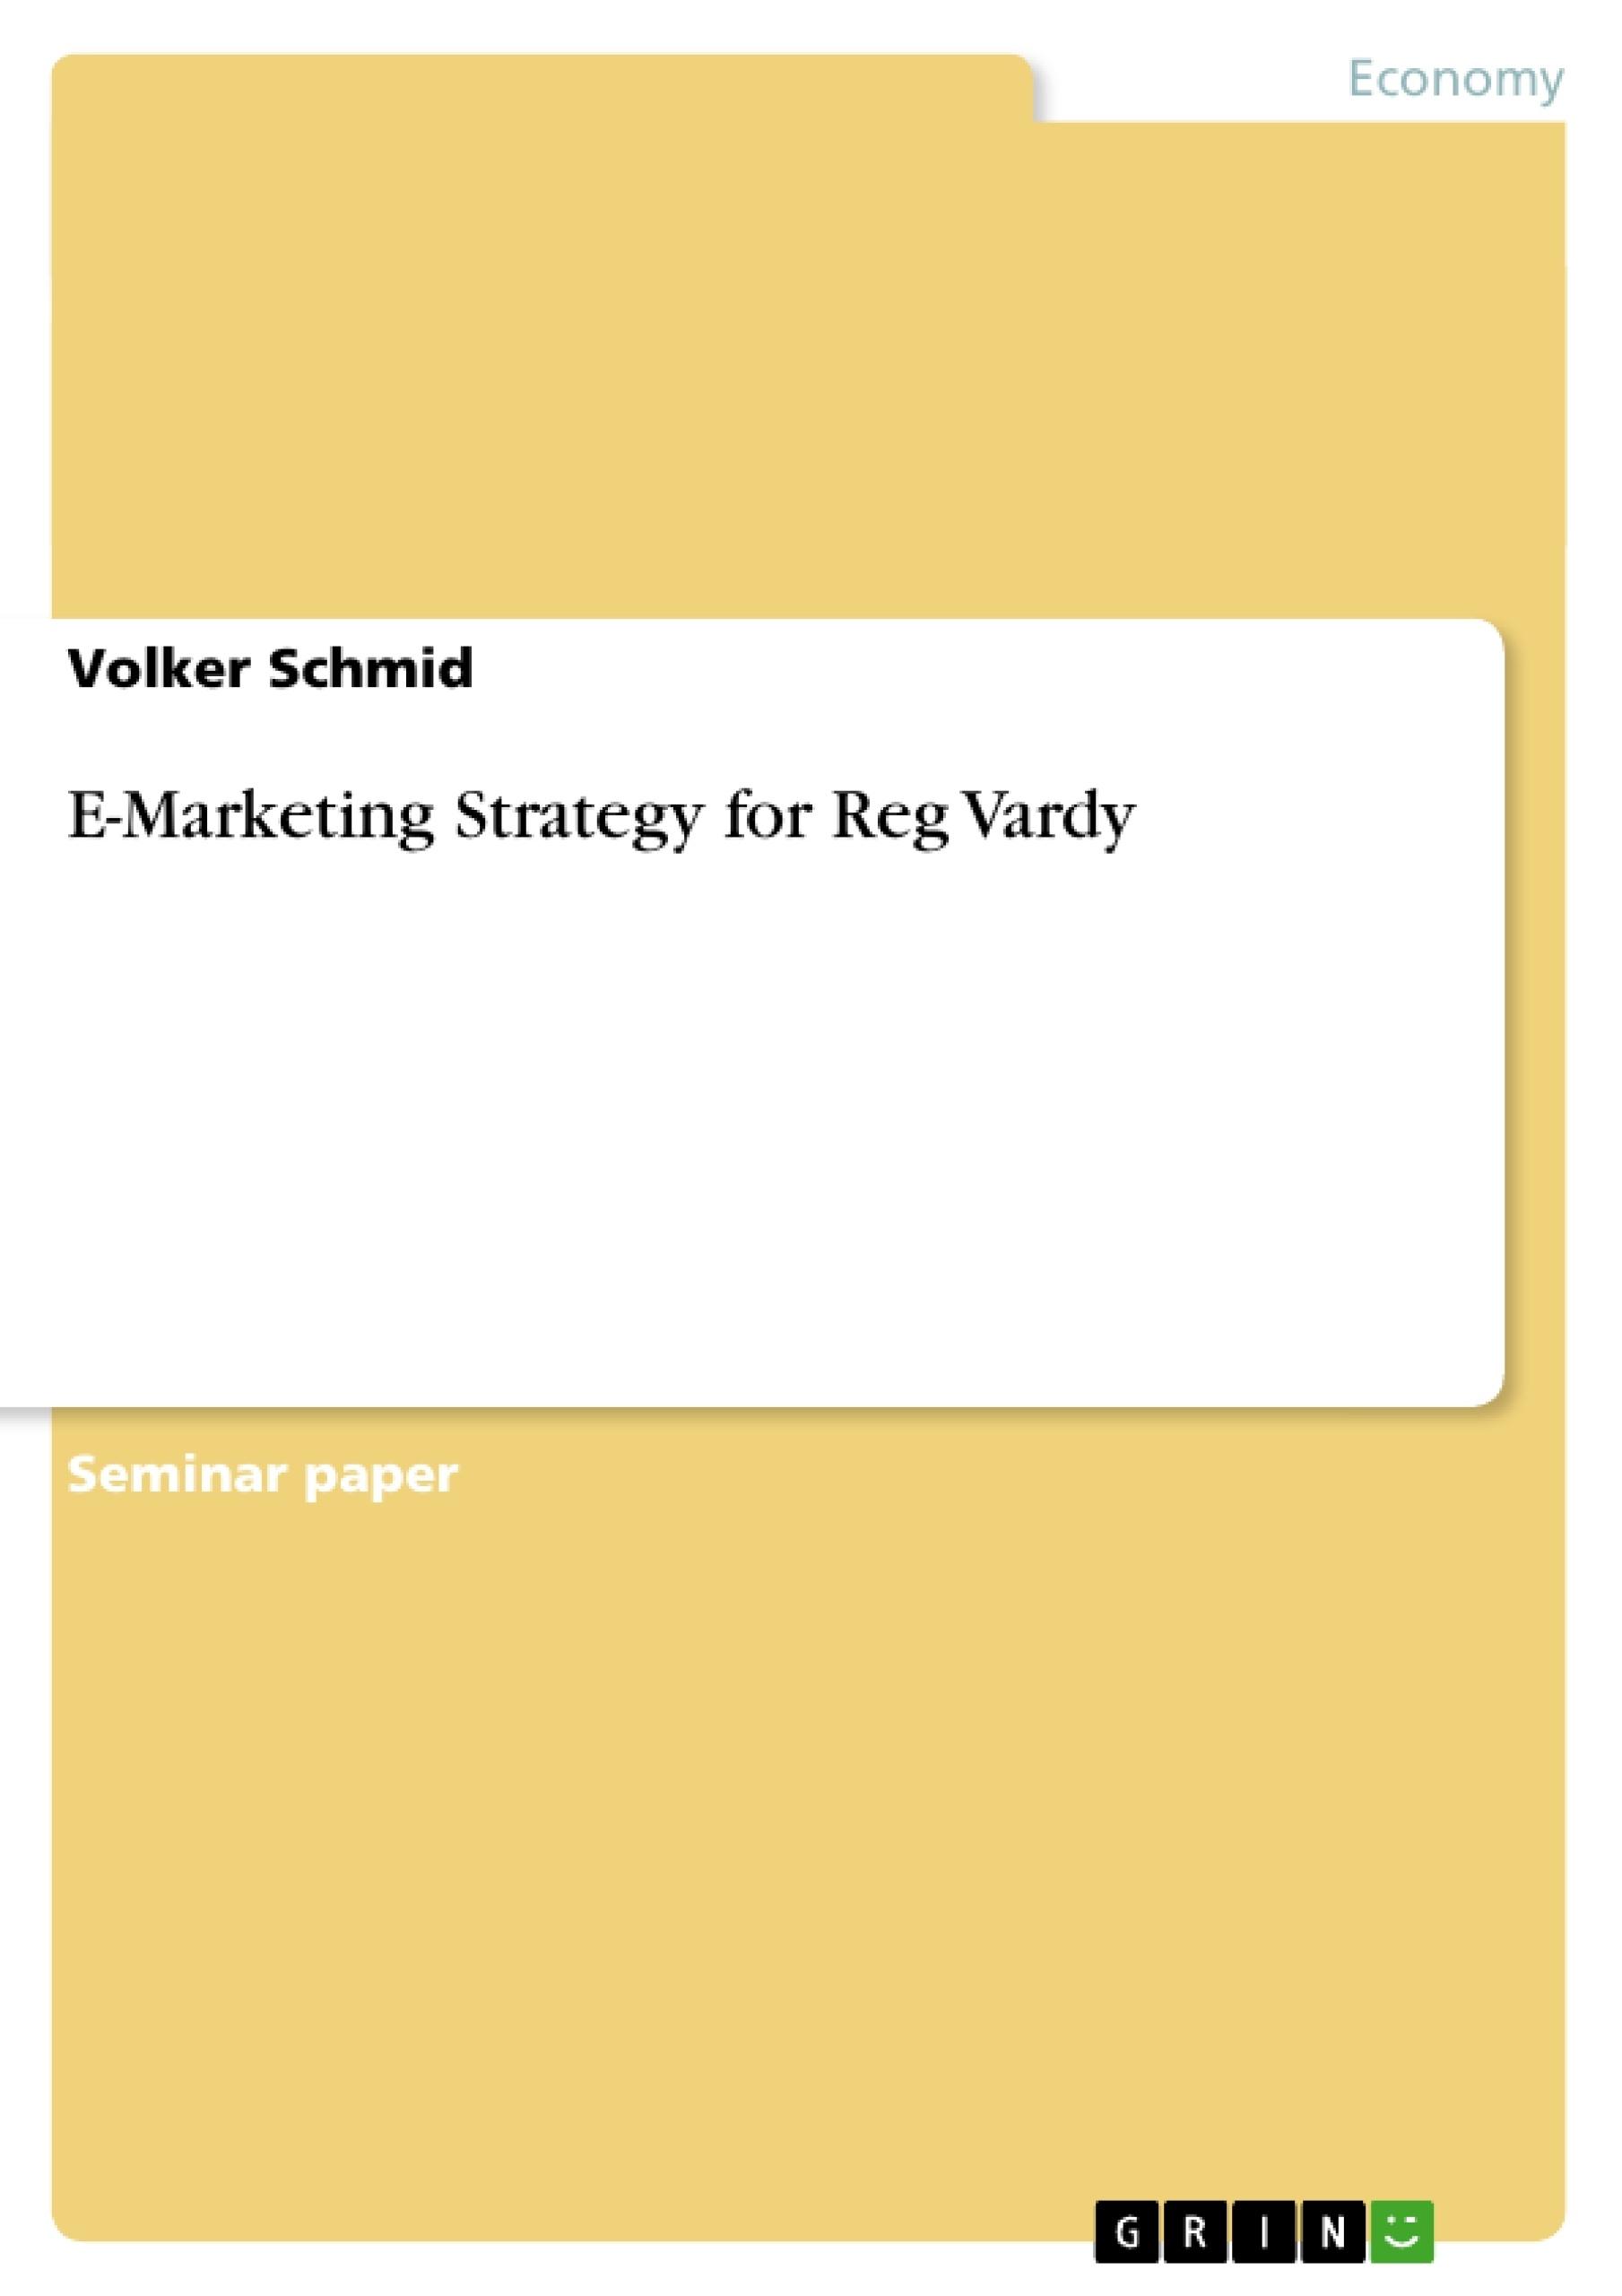 Title: E-Marketing Strategy for Reg Vardy